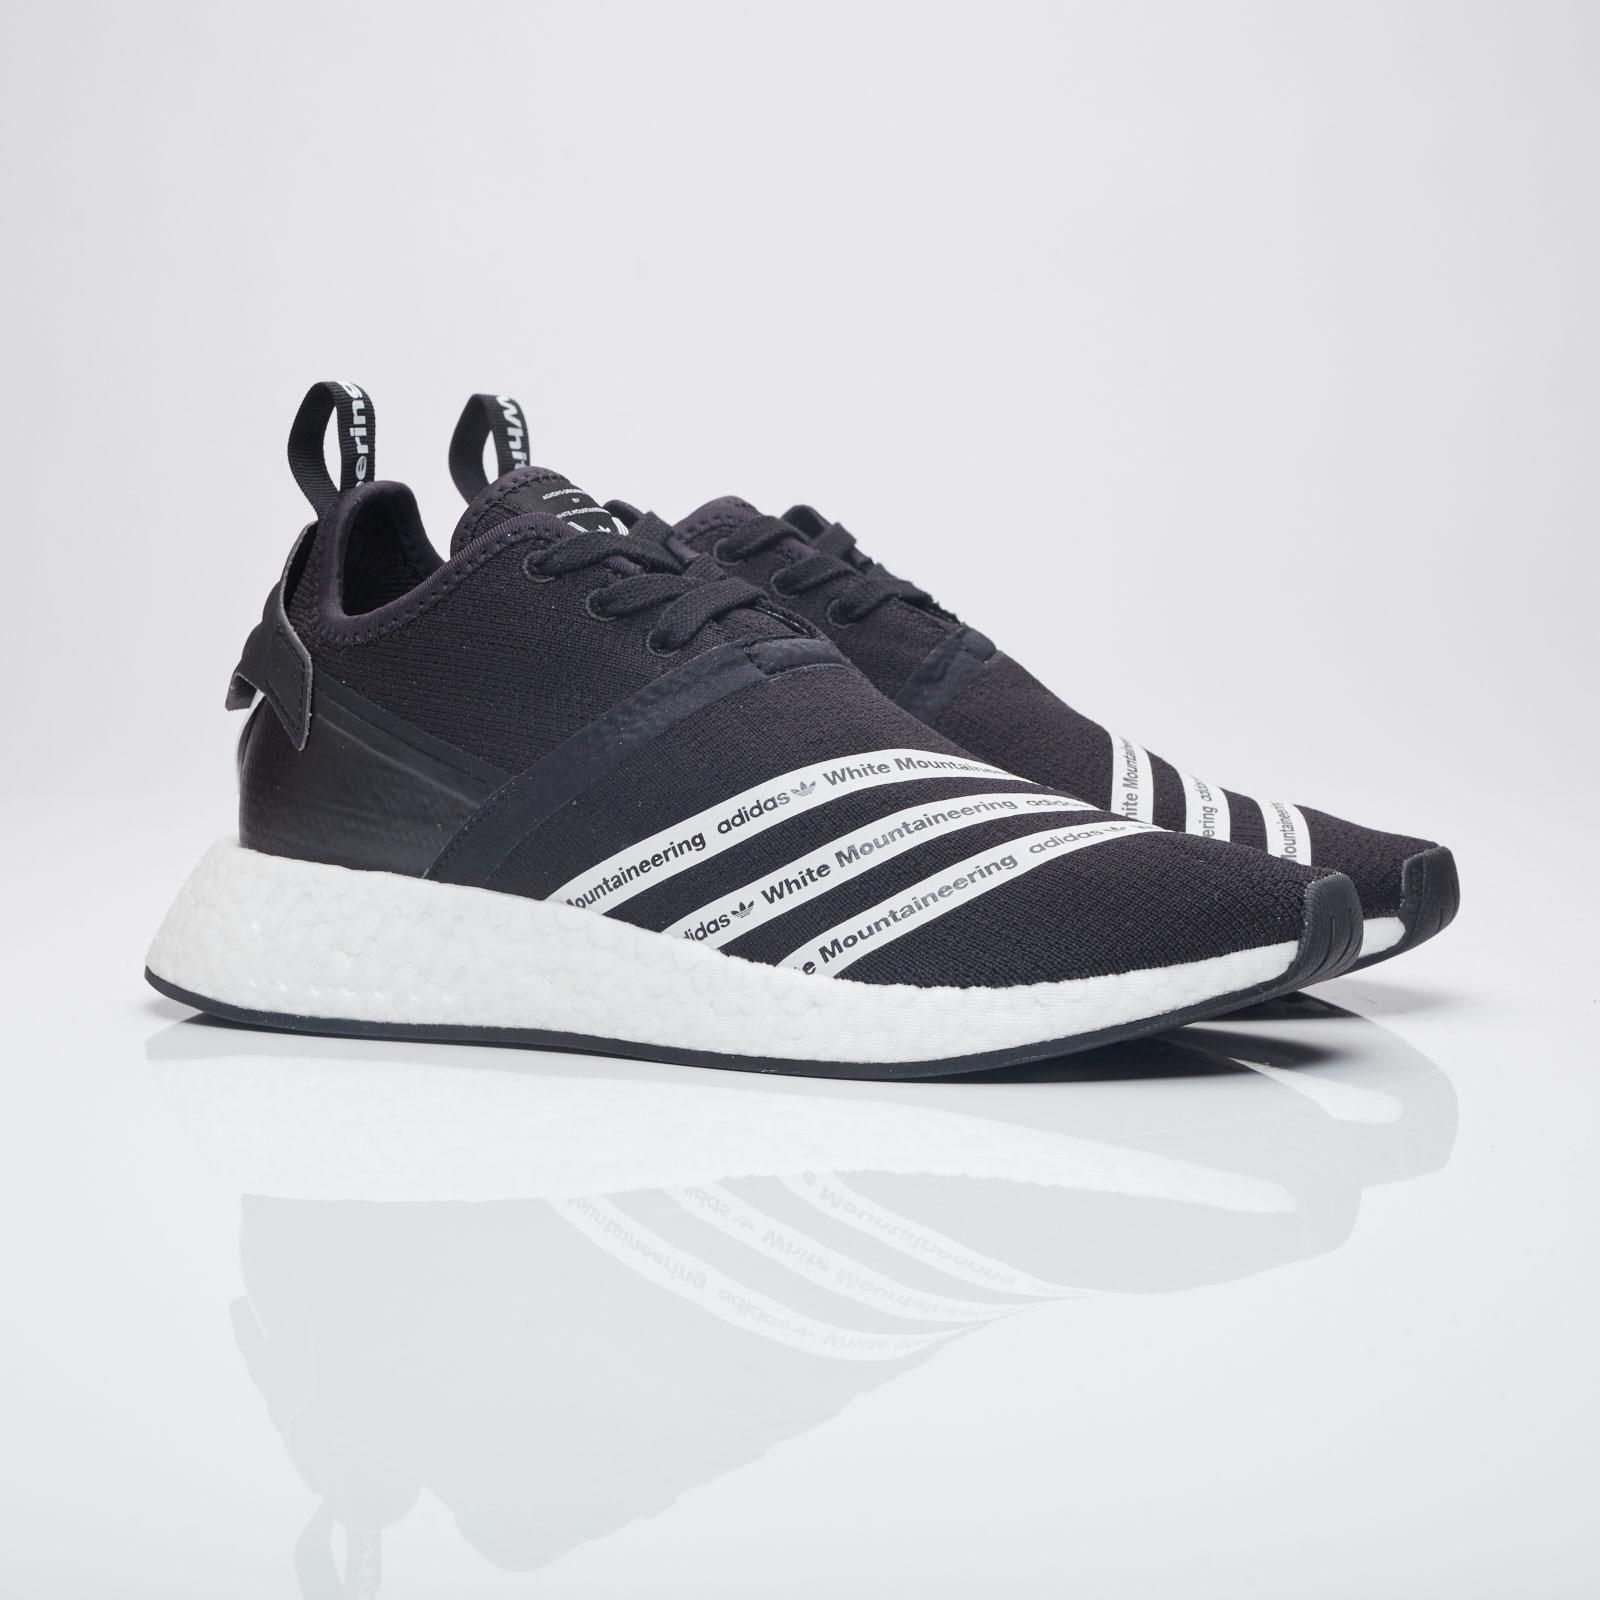 fbd4a4ab0359 adidas Wm Nmd R2 Pk - Bb2978 - Sneakersnstuff